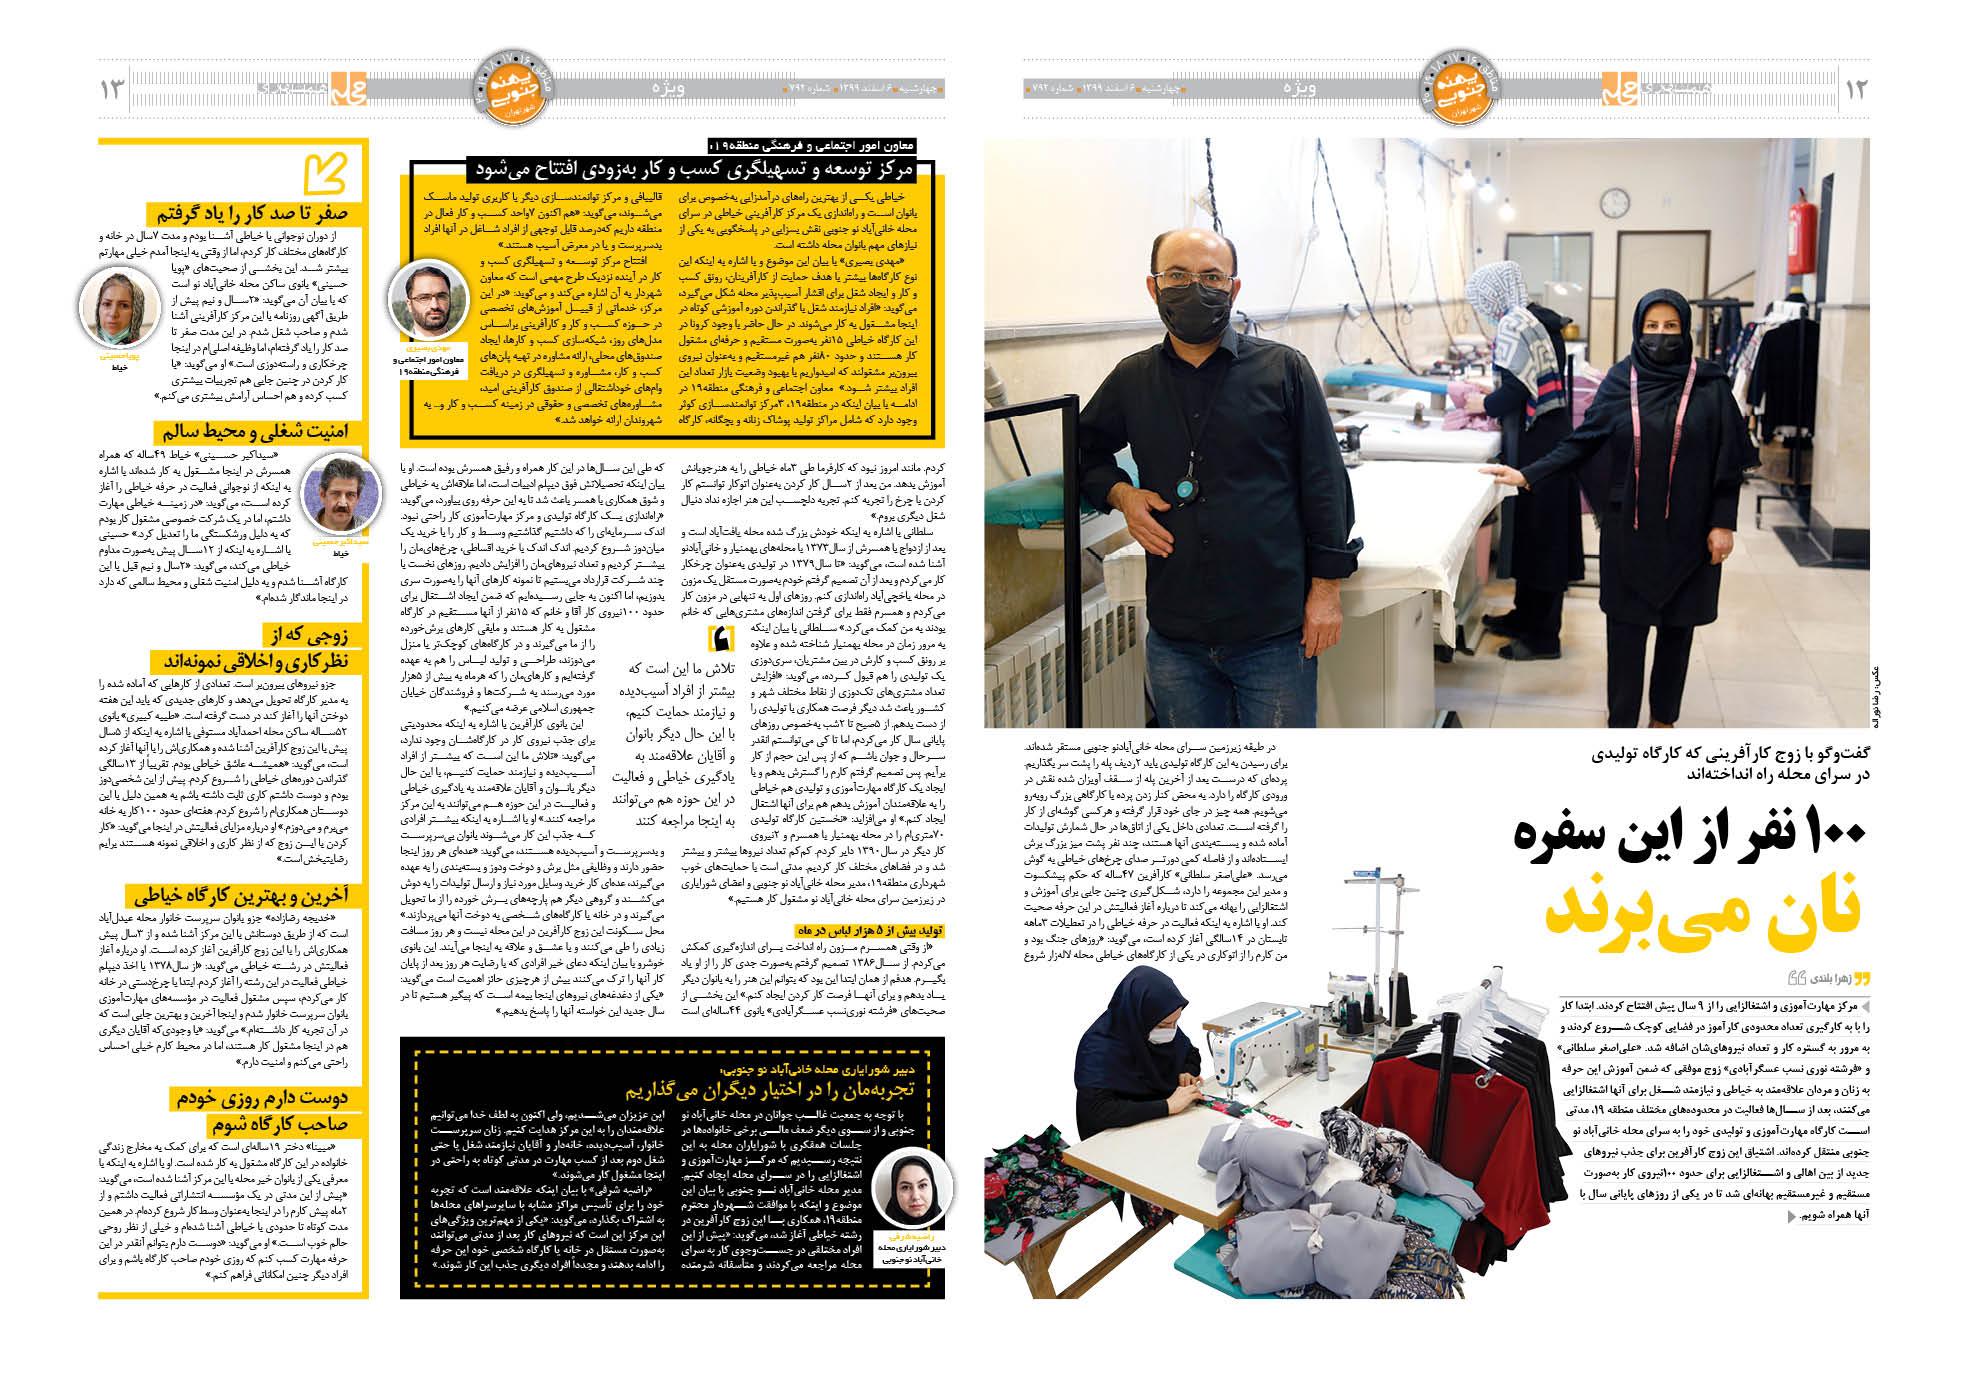 صفحه 12 محله